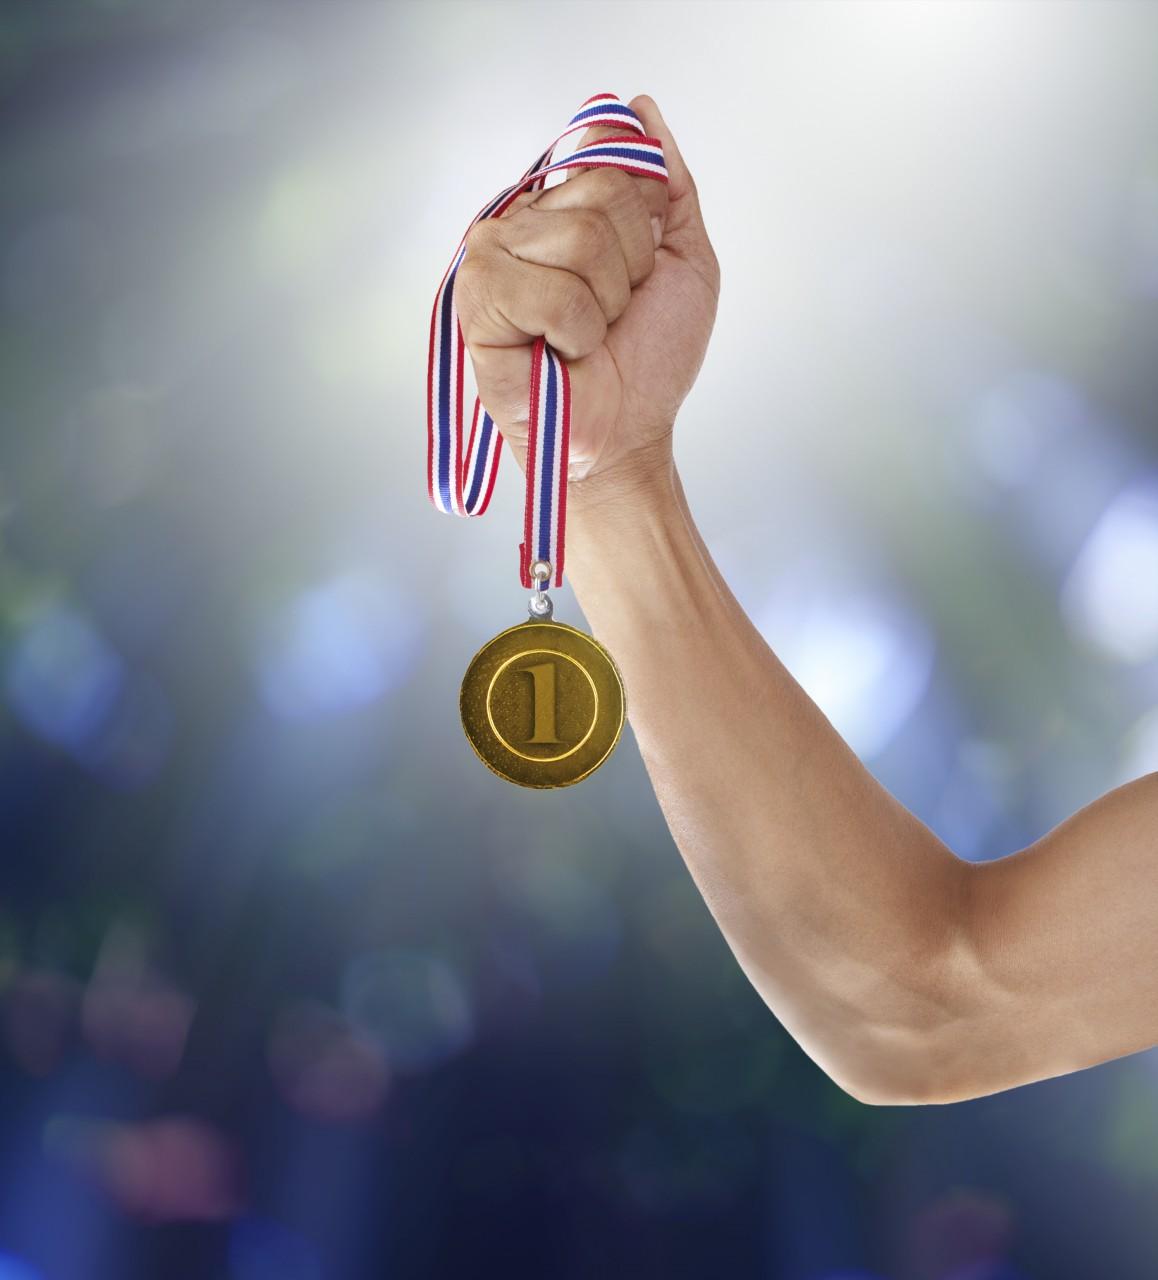 картинки на тему победа в спорте большого